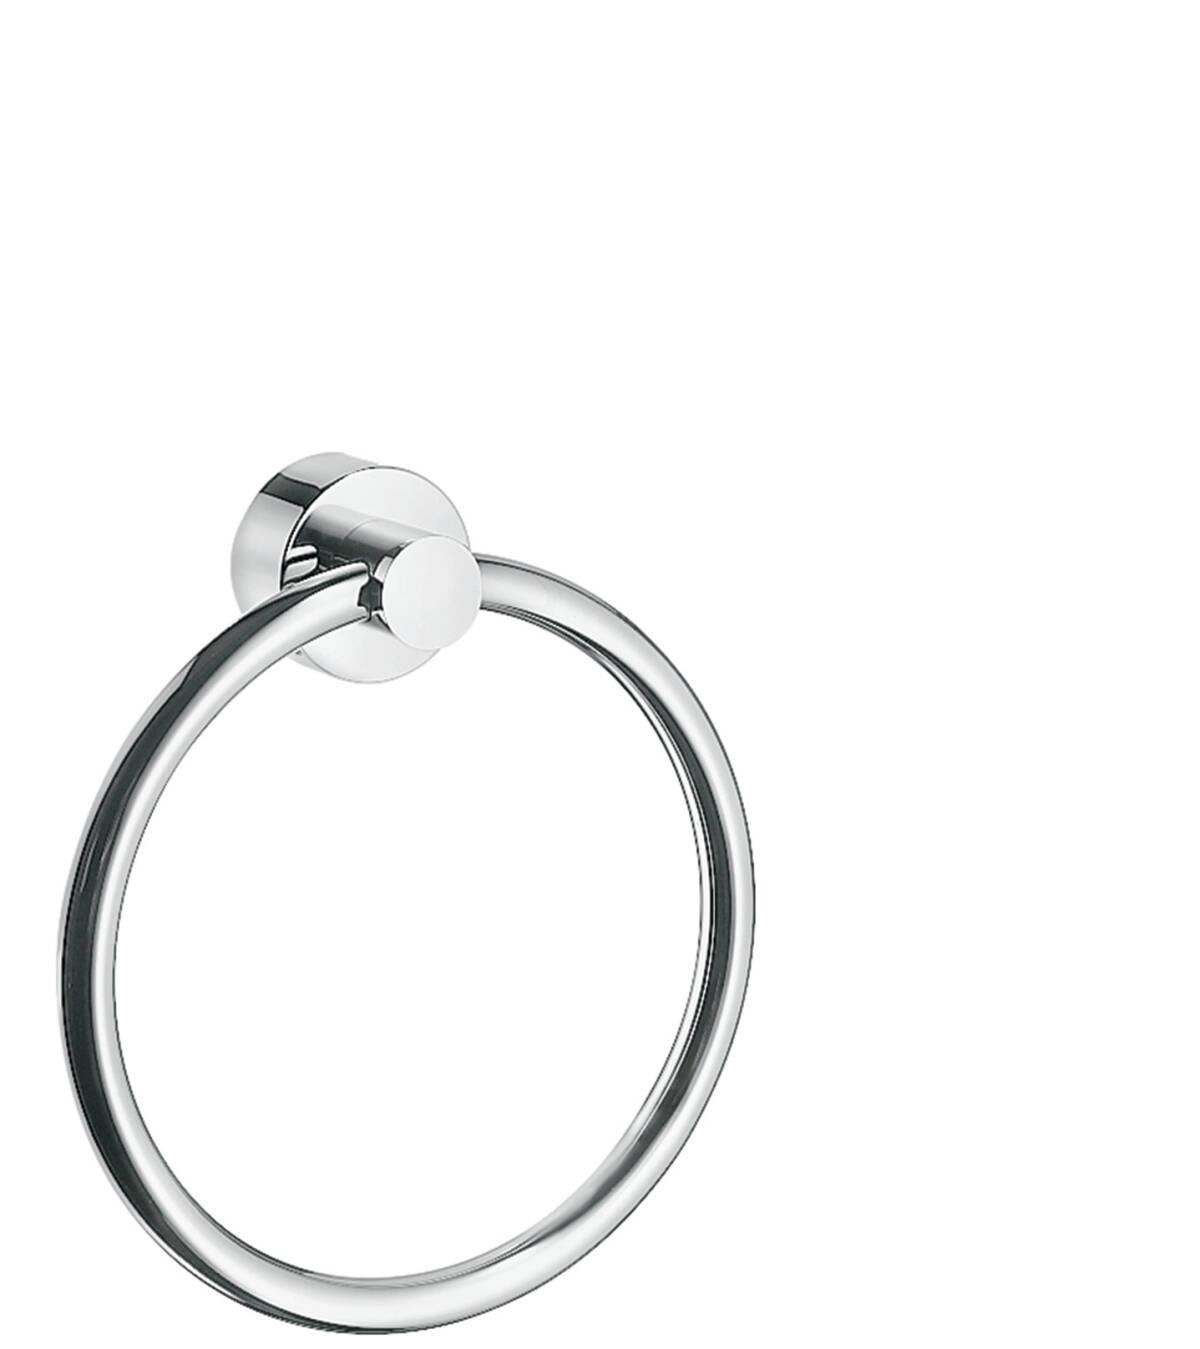 Towel ring, Brushed Chrome, 41521260